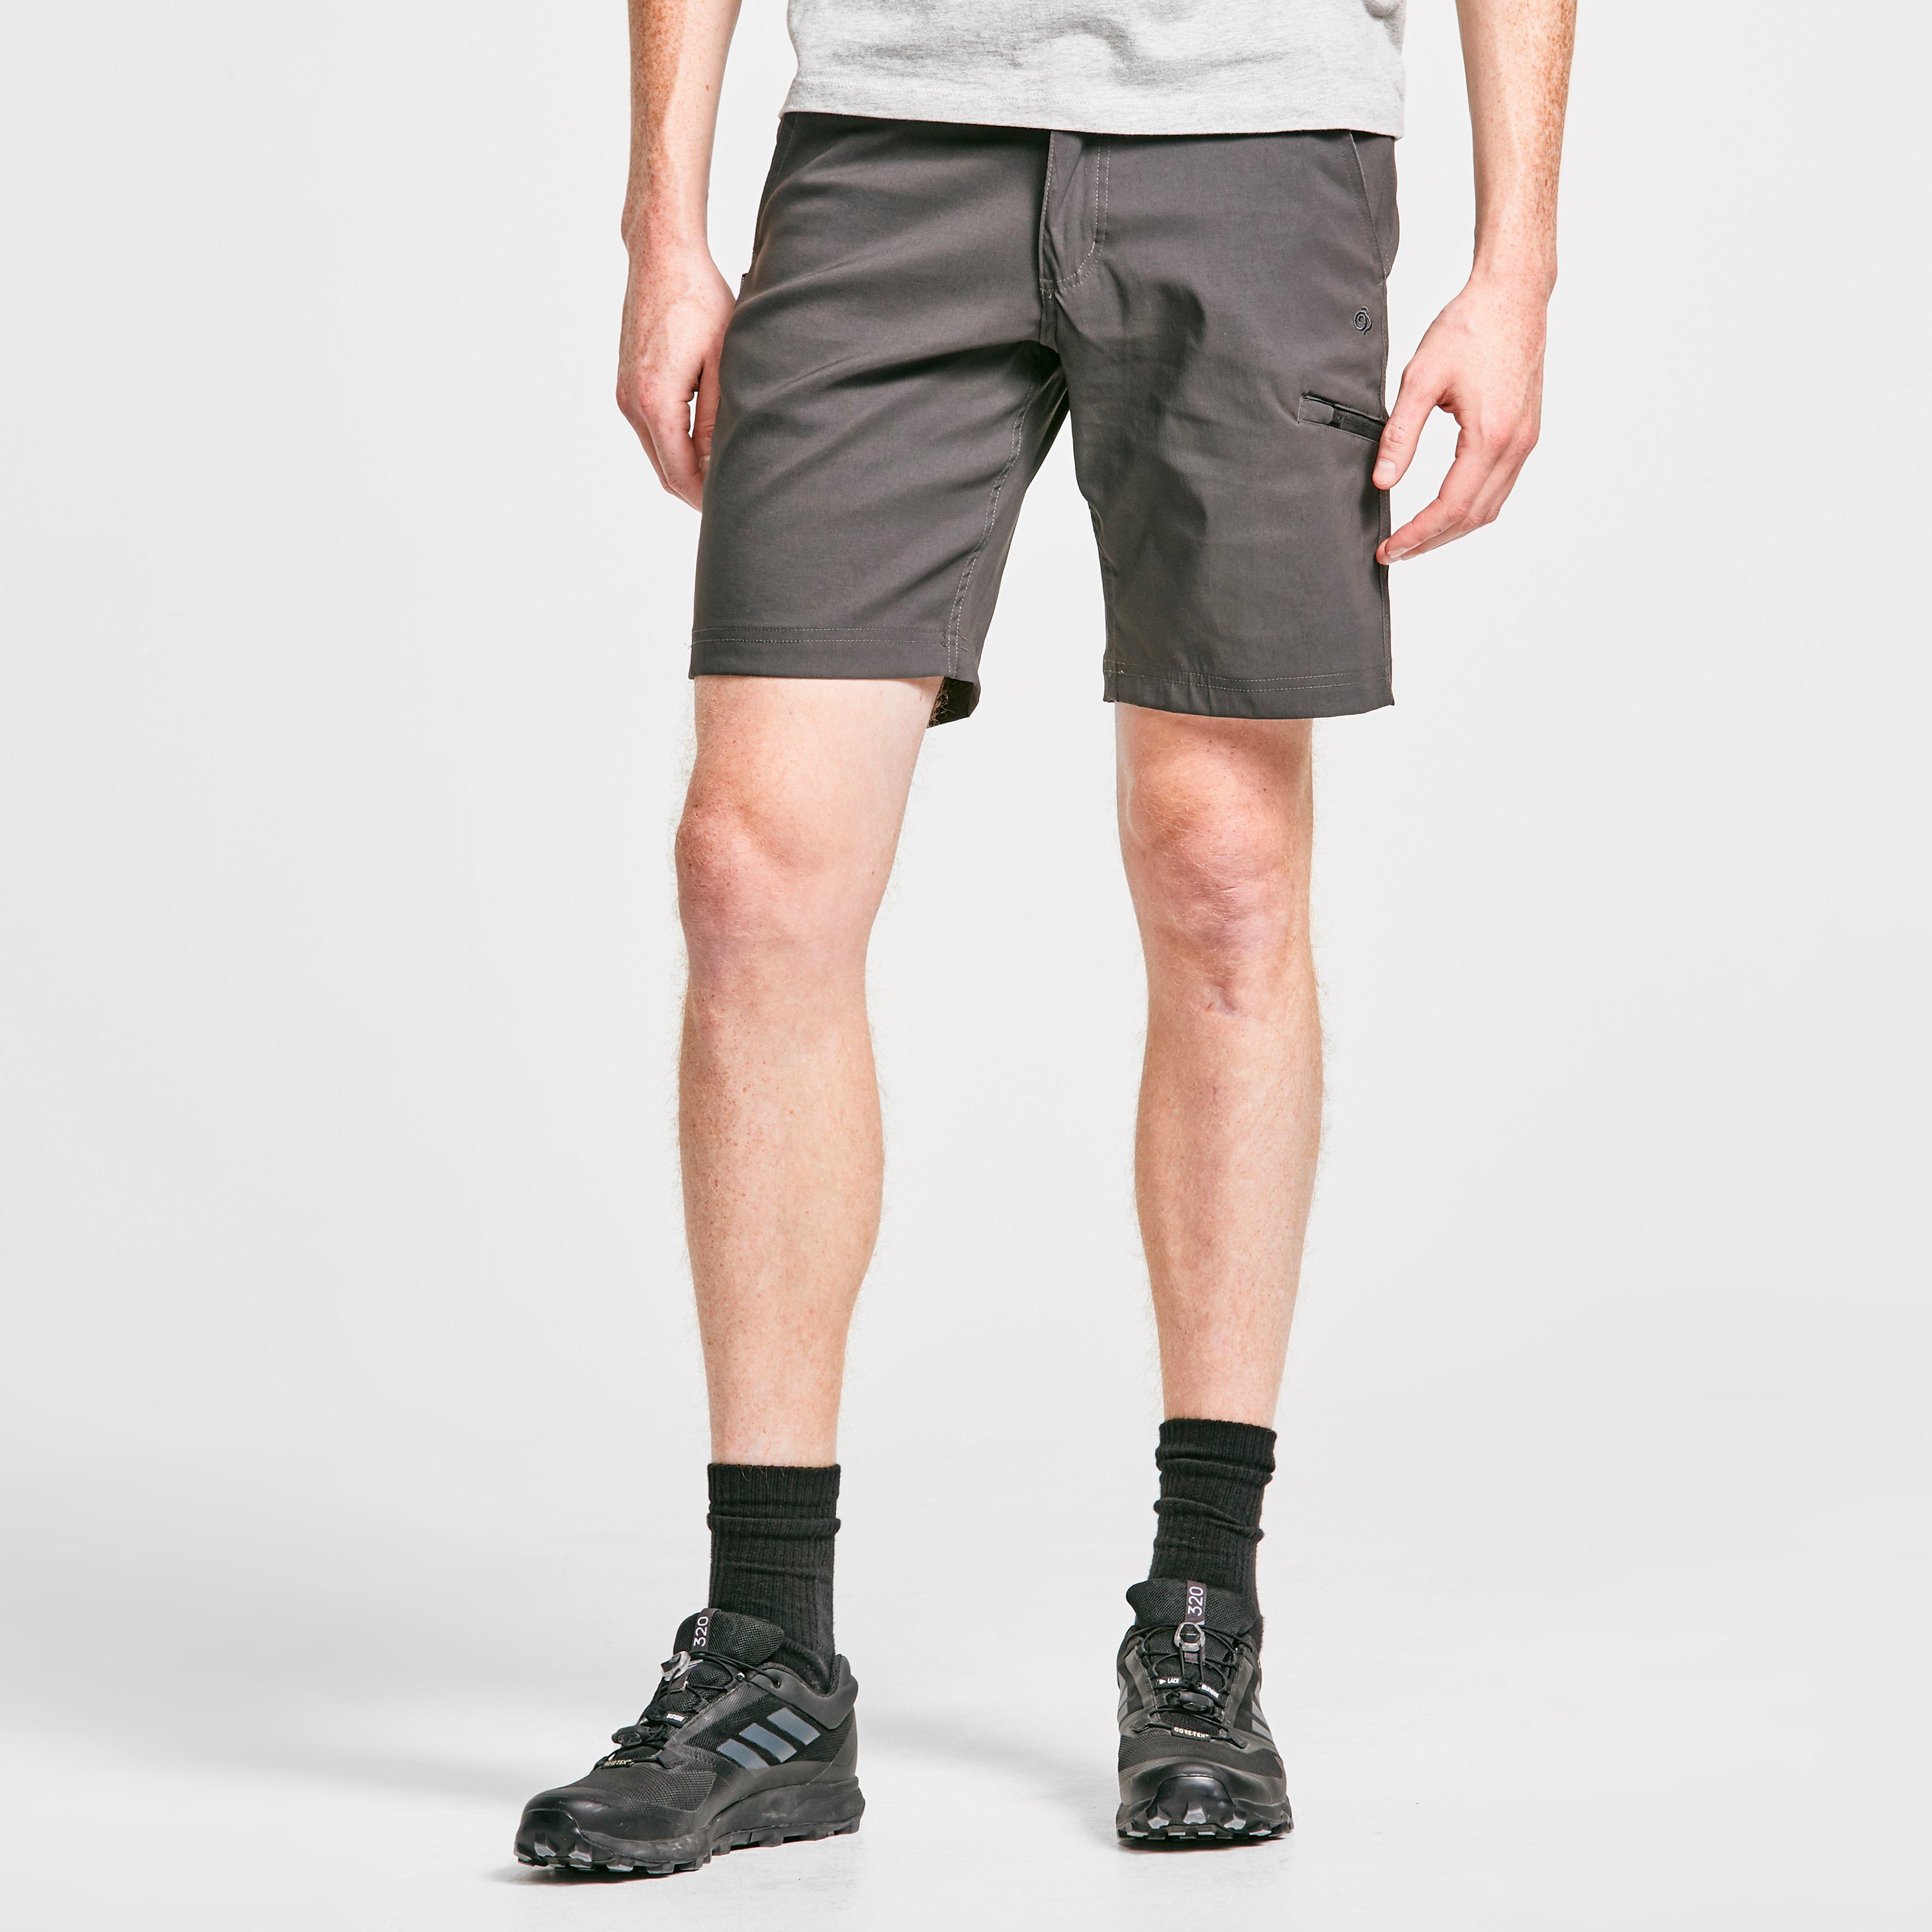 Craghoppers Craghoppers Mens Kiwi Pro Shorts, Grey